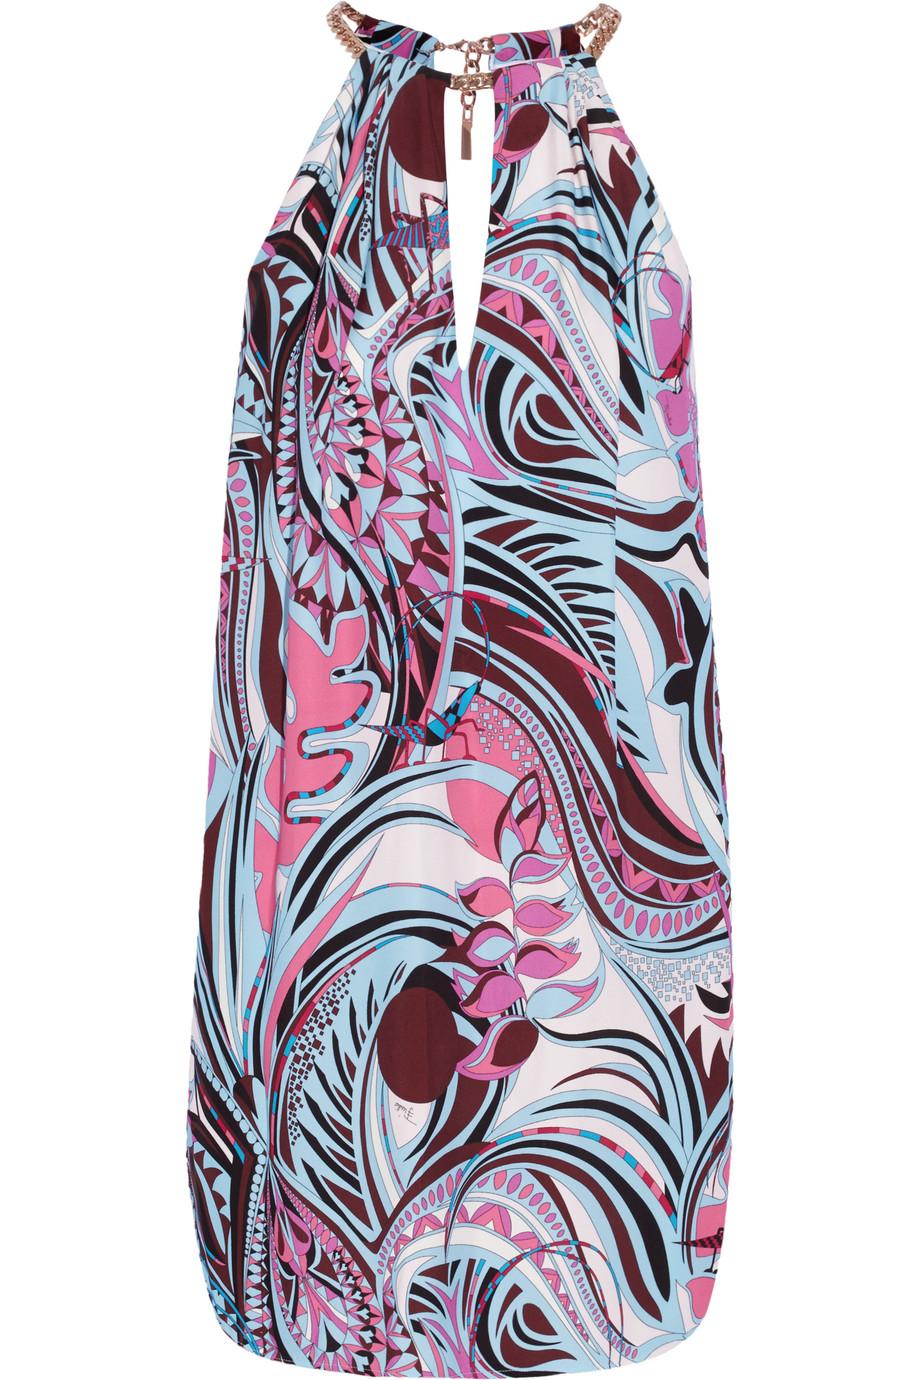 Emilio Pucci Printed Cady Mini Dress, Lavender/Sky Blue, Women's - Printed, Size: 42